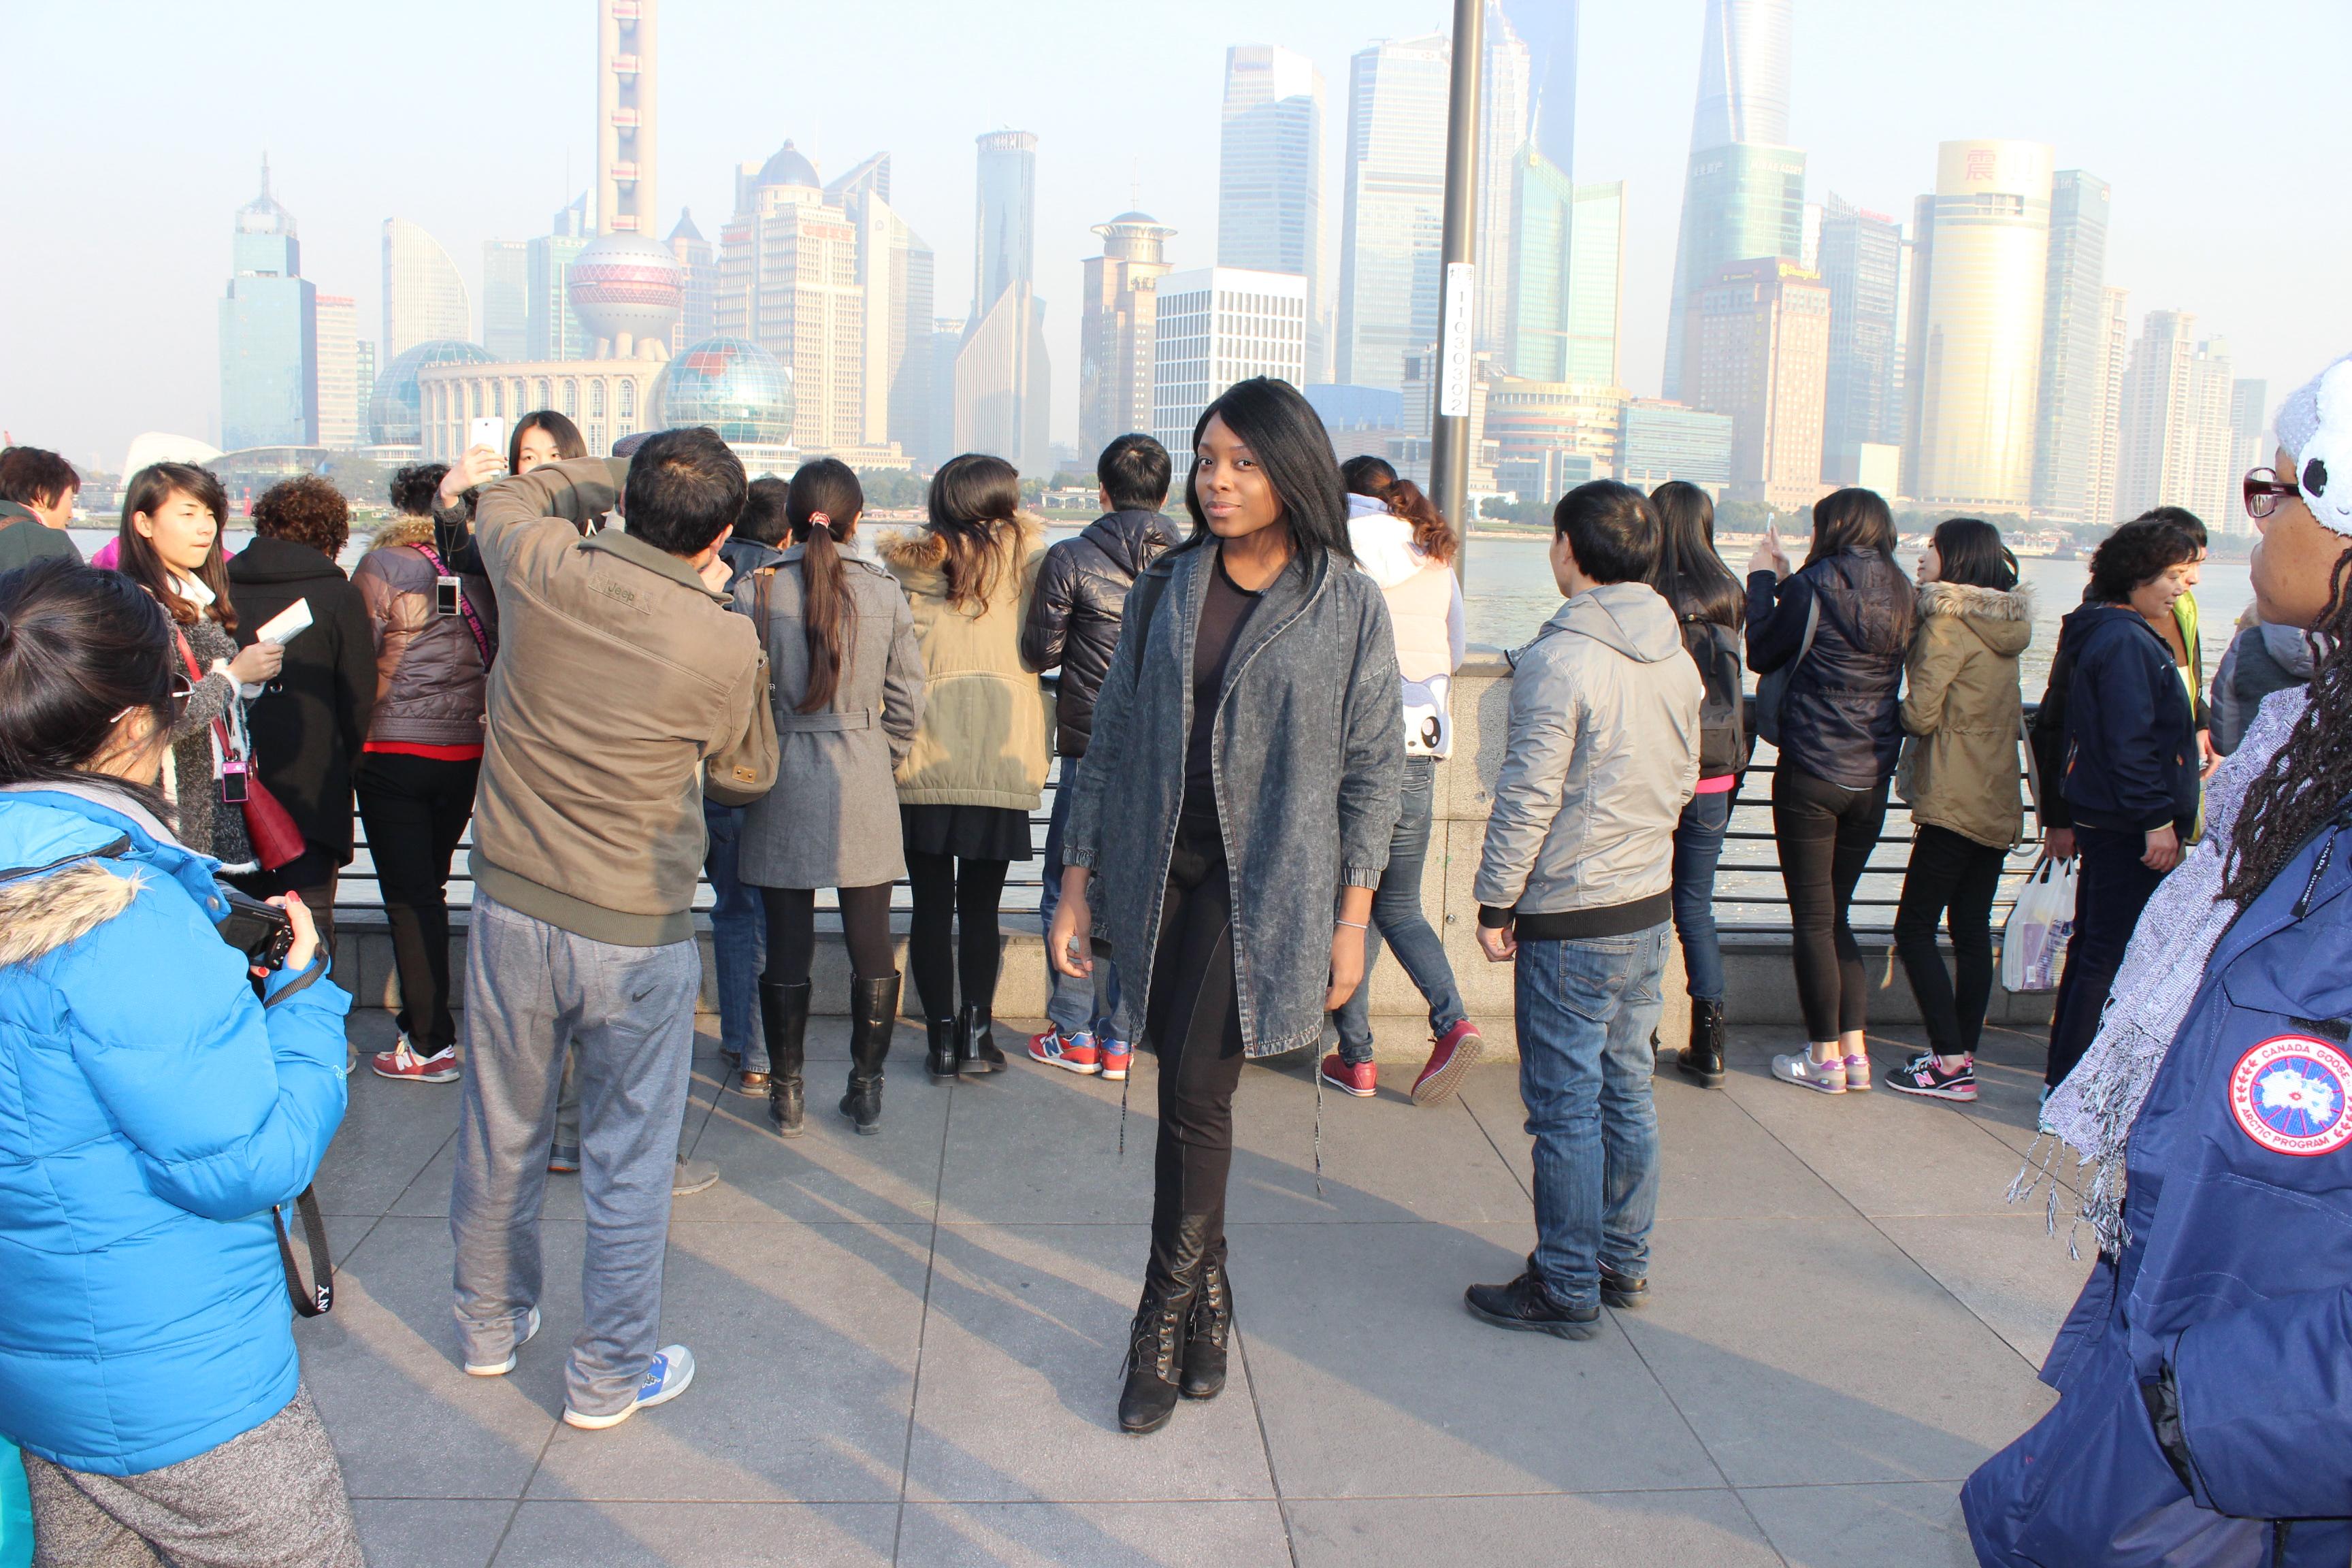 CAPAStudyAbroad_Bejing_Fall2014_from_Jasheah_Howard_-_Thebund_-_Shanghai_4